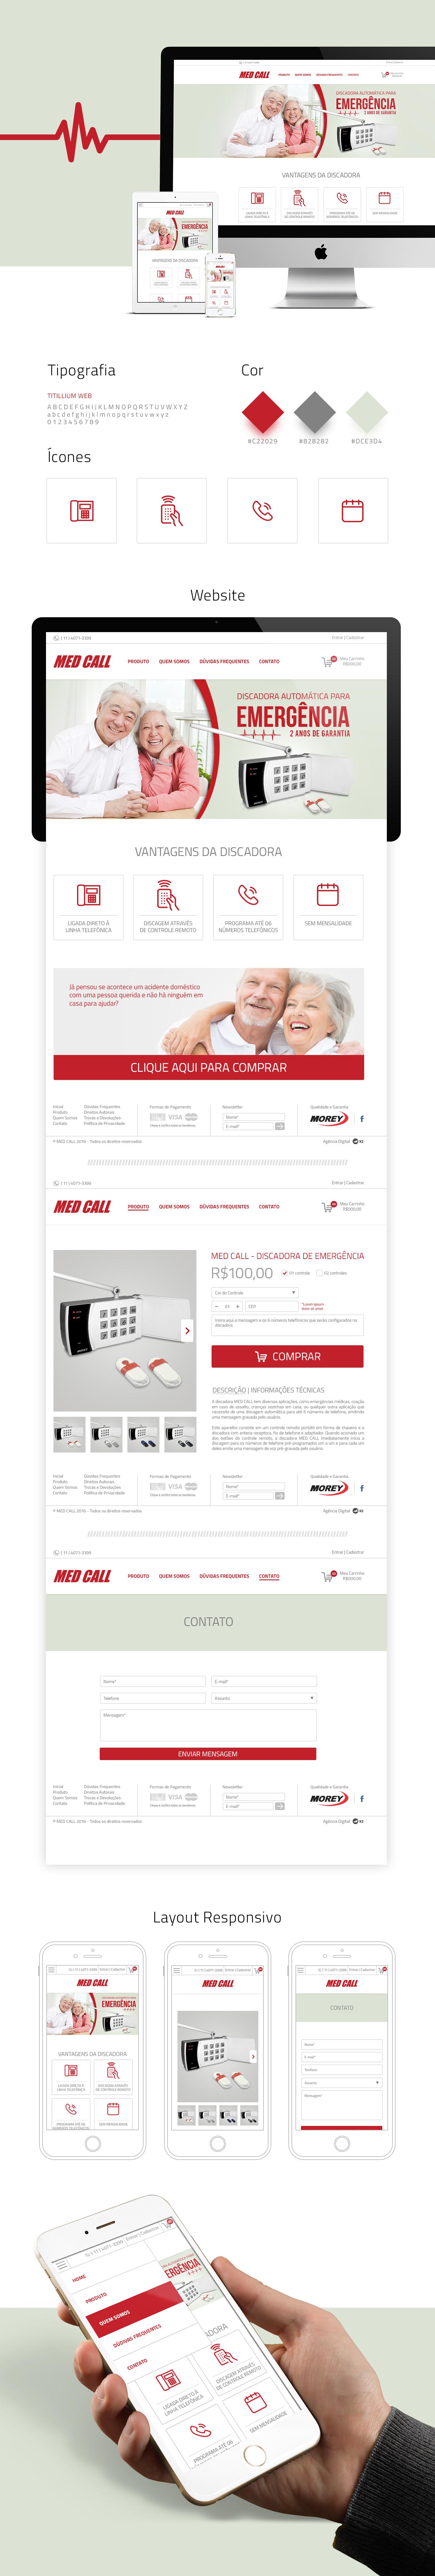 Website - MedCall